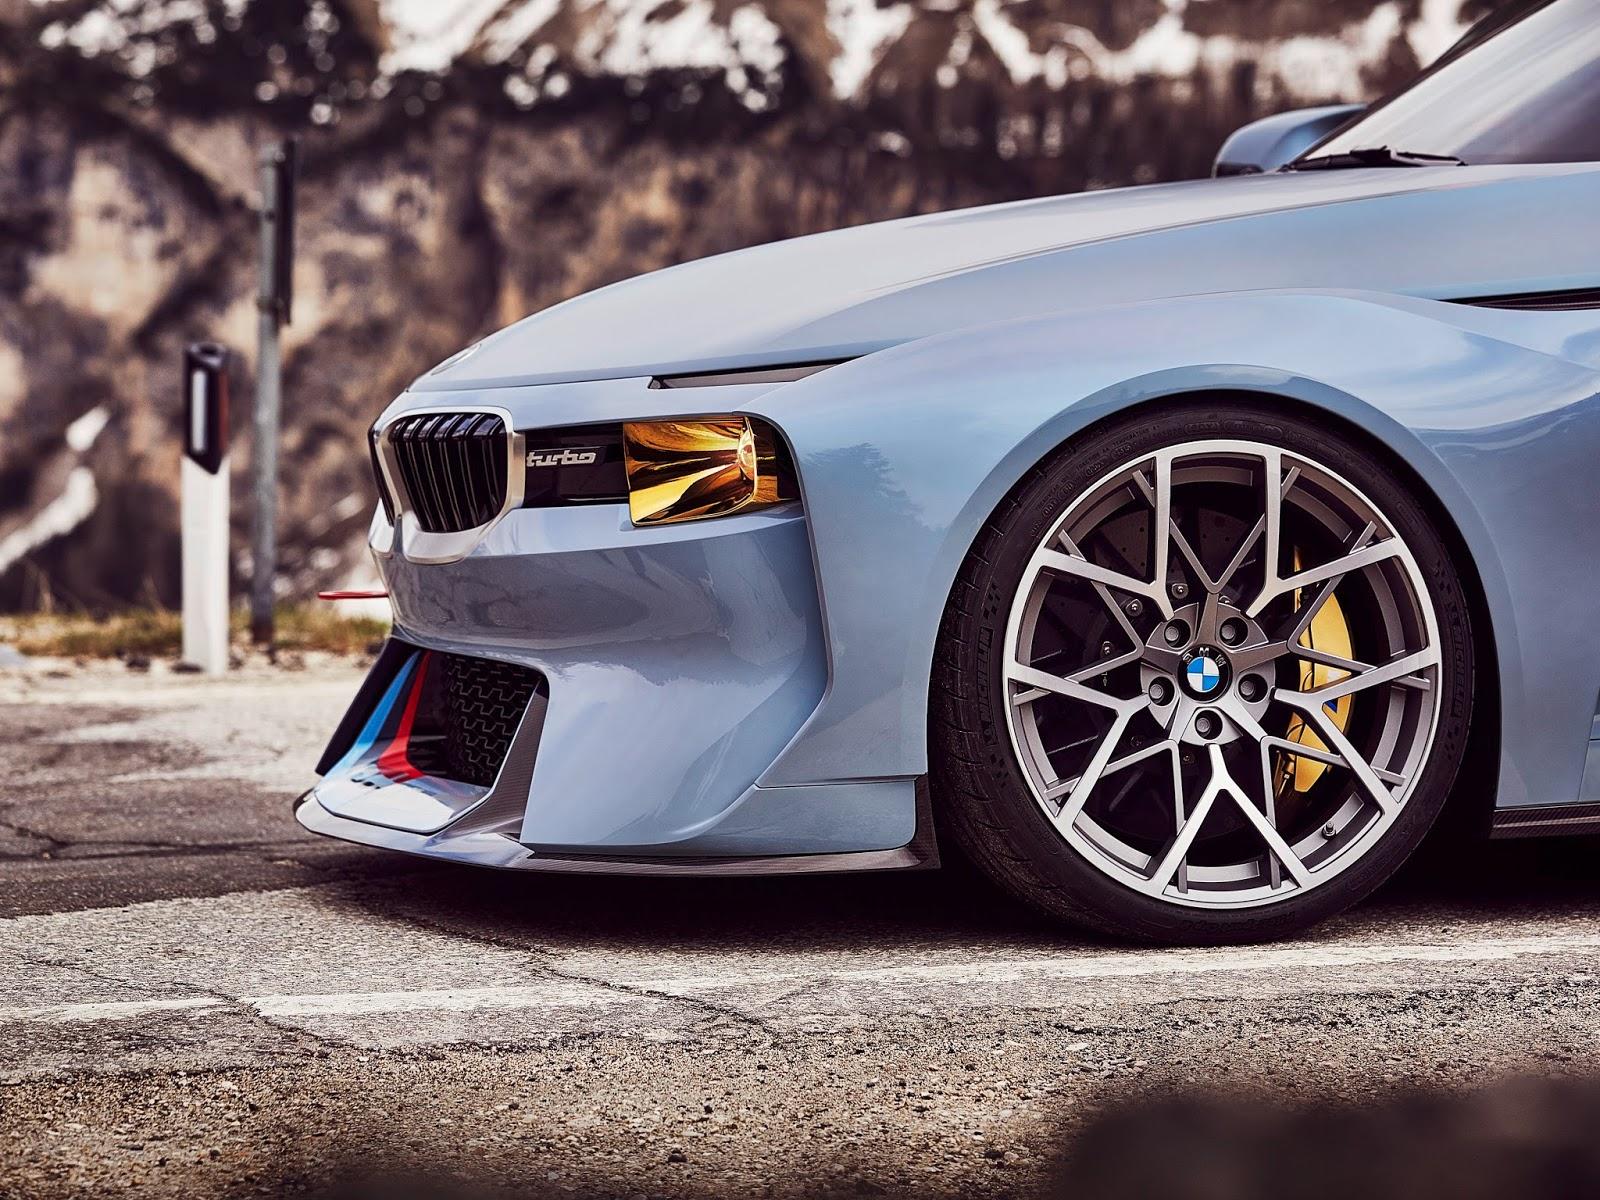 P90219723 highRes bmw 2002 hommage 05 1 1 H BMW γιορτάζει τα 50 χρόνια της θρυλικής 2002 turbo και παρουσιάζει την Bmw 2002 Hommage BMW, BMW 2002, BMW 2002 turbo, BMW Concept, BMW Hommage, supercars, videos